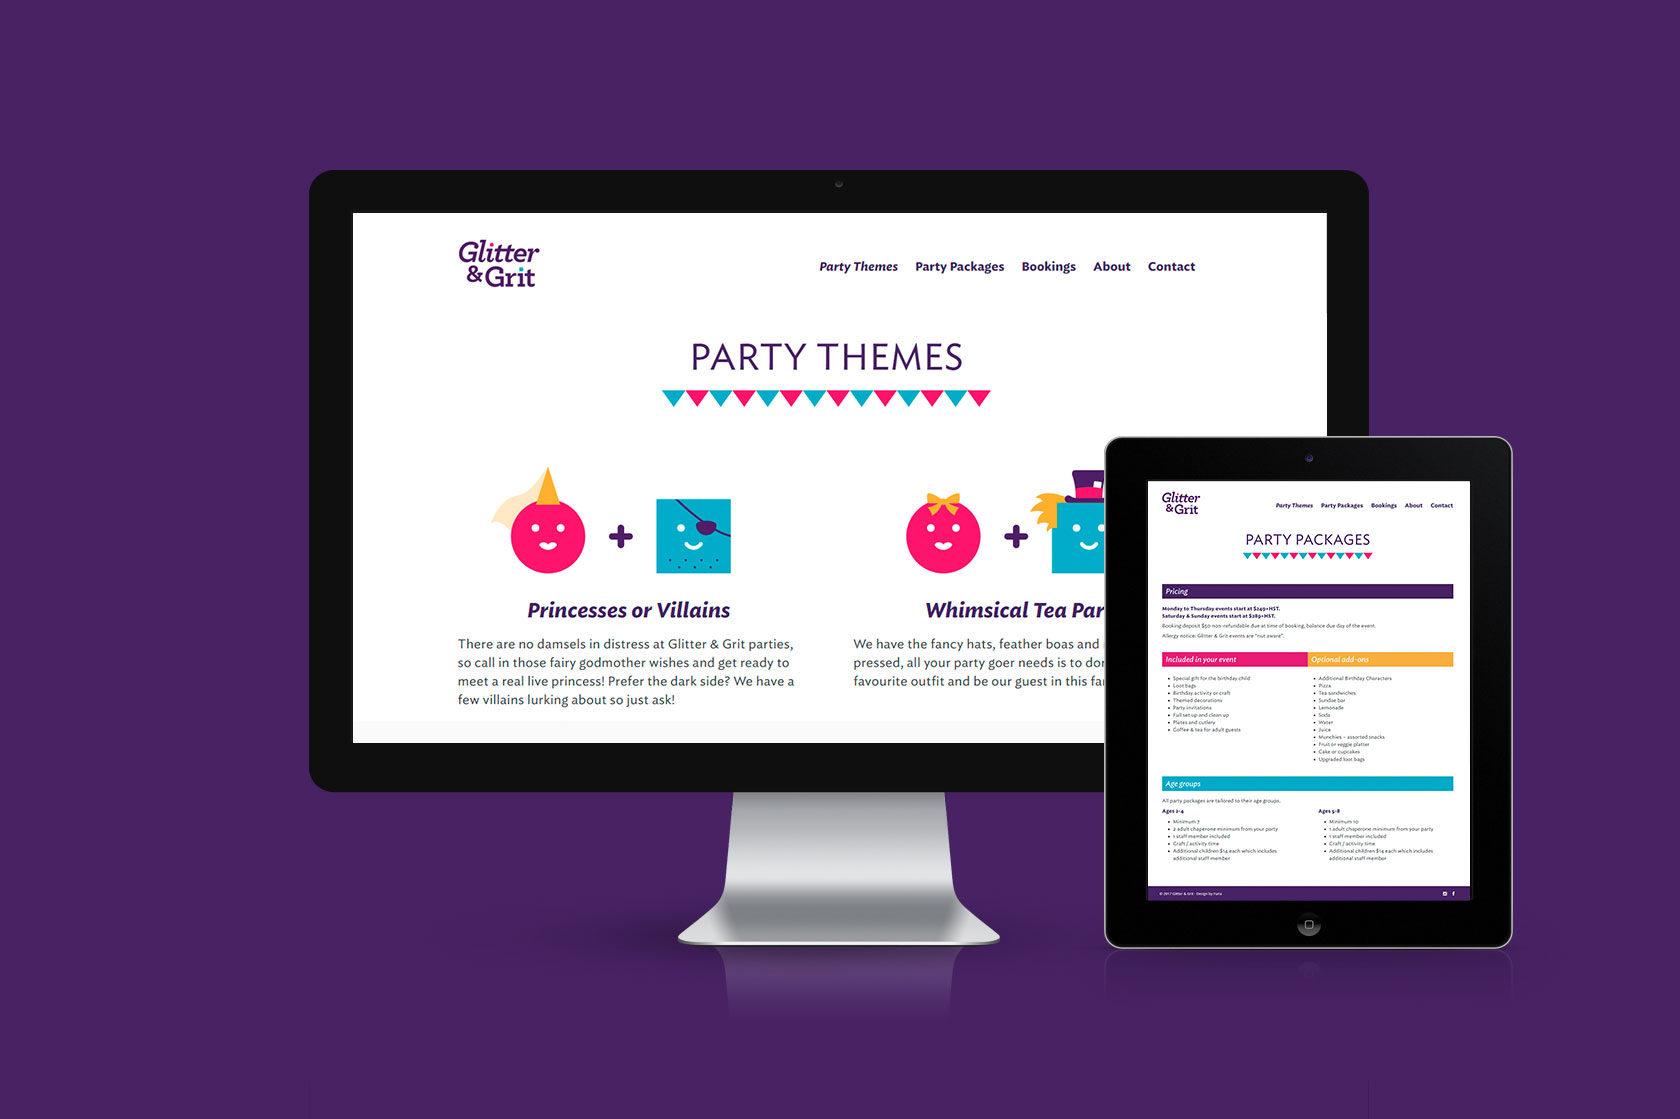 Glitter & Grit Website Development by Furia